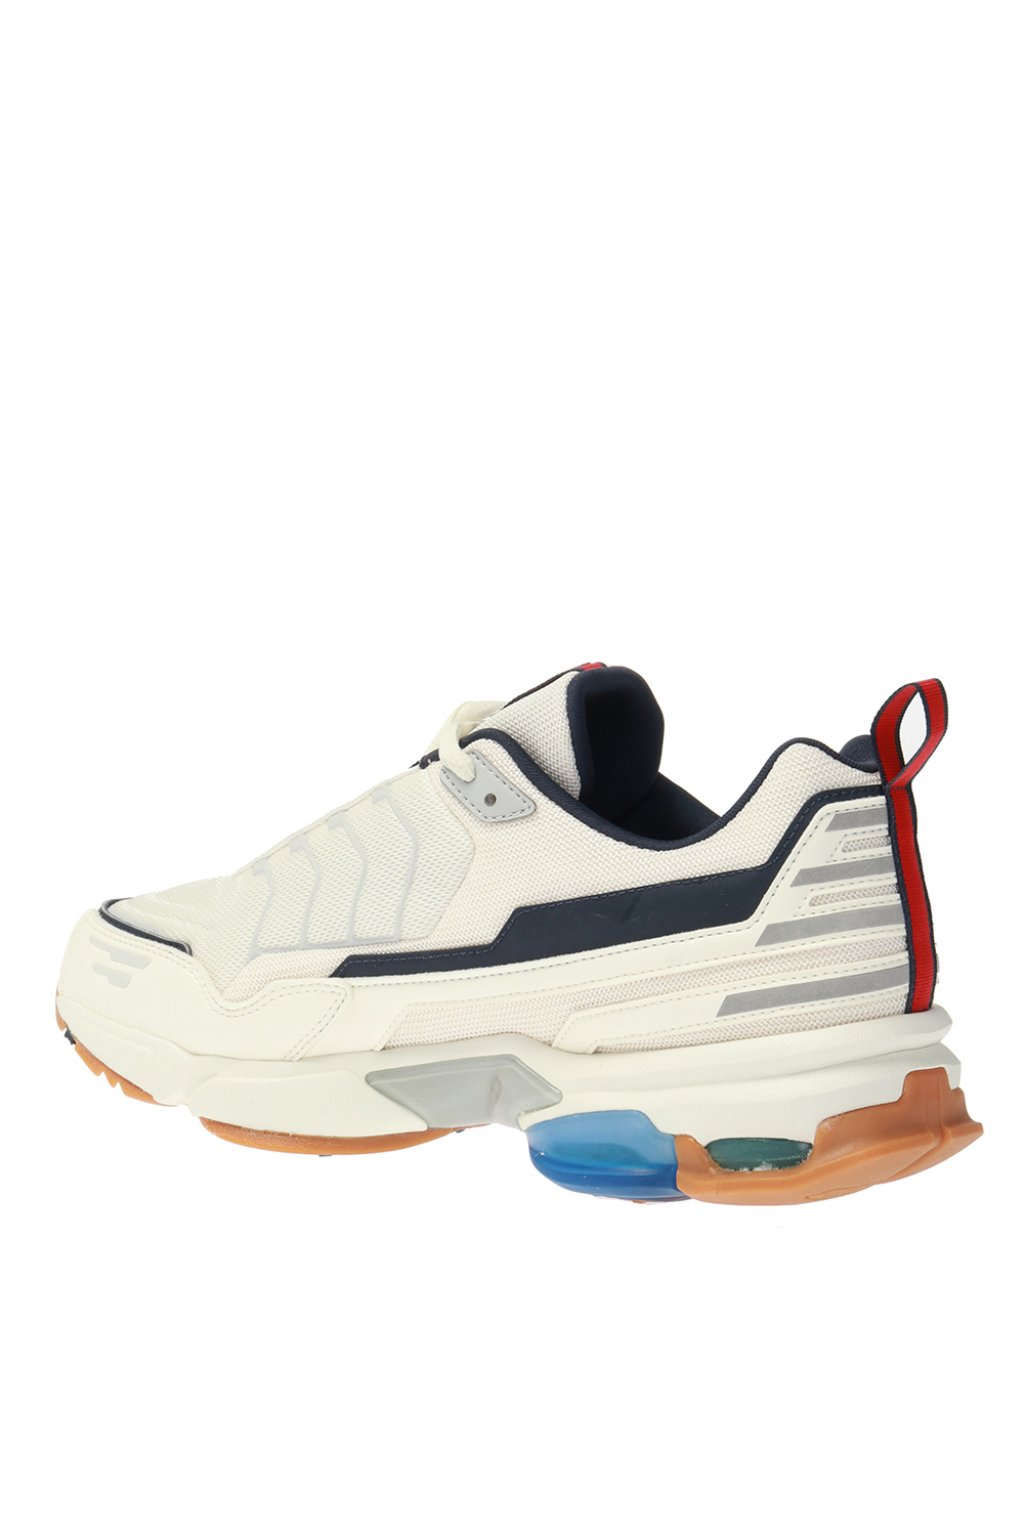 Reebok 'DMX6 MMI' sneakers